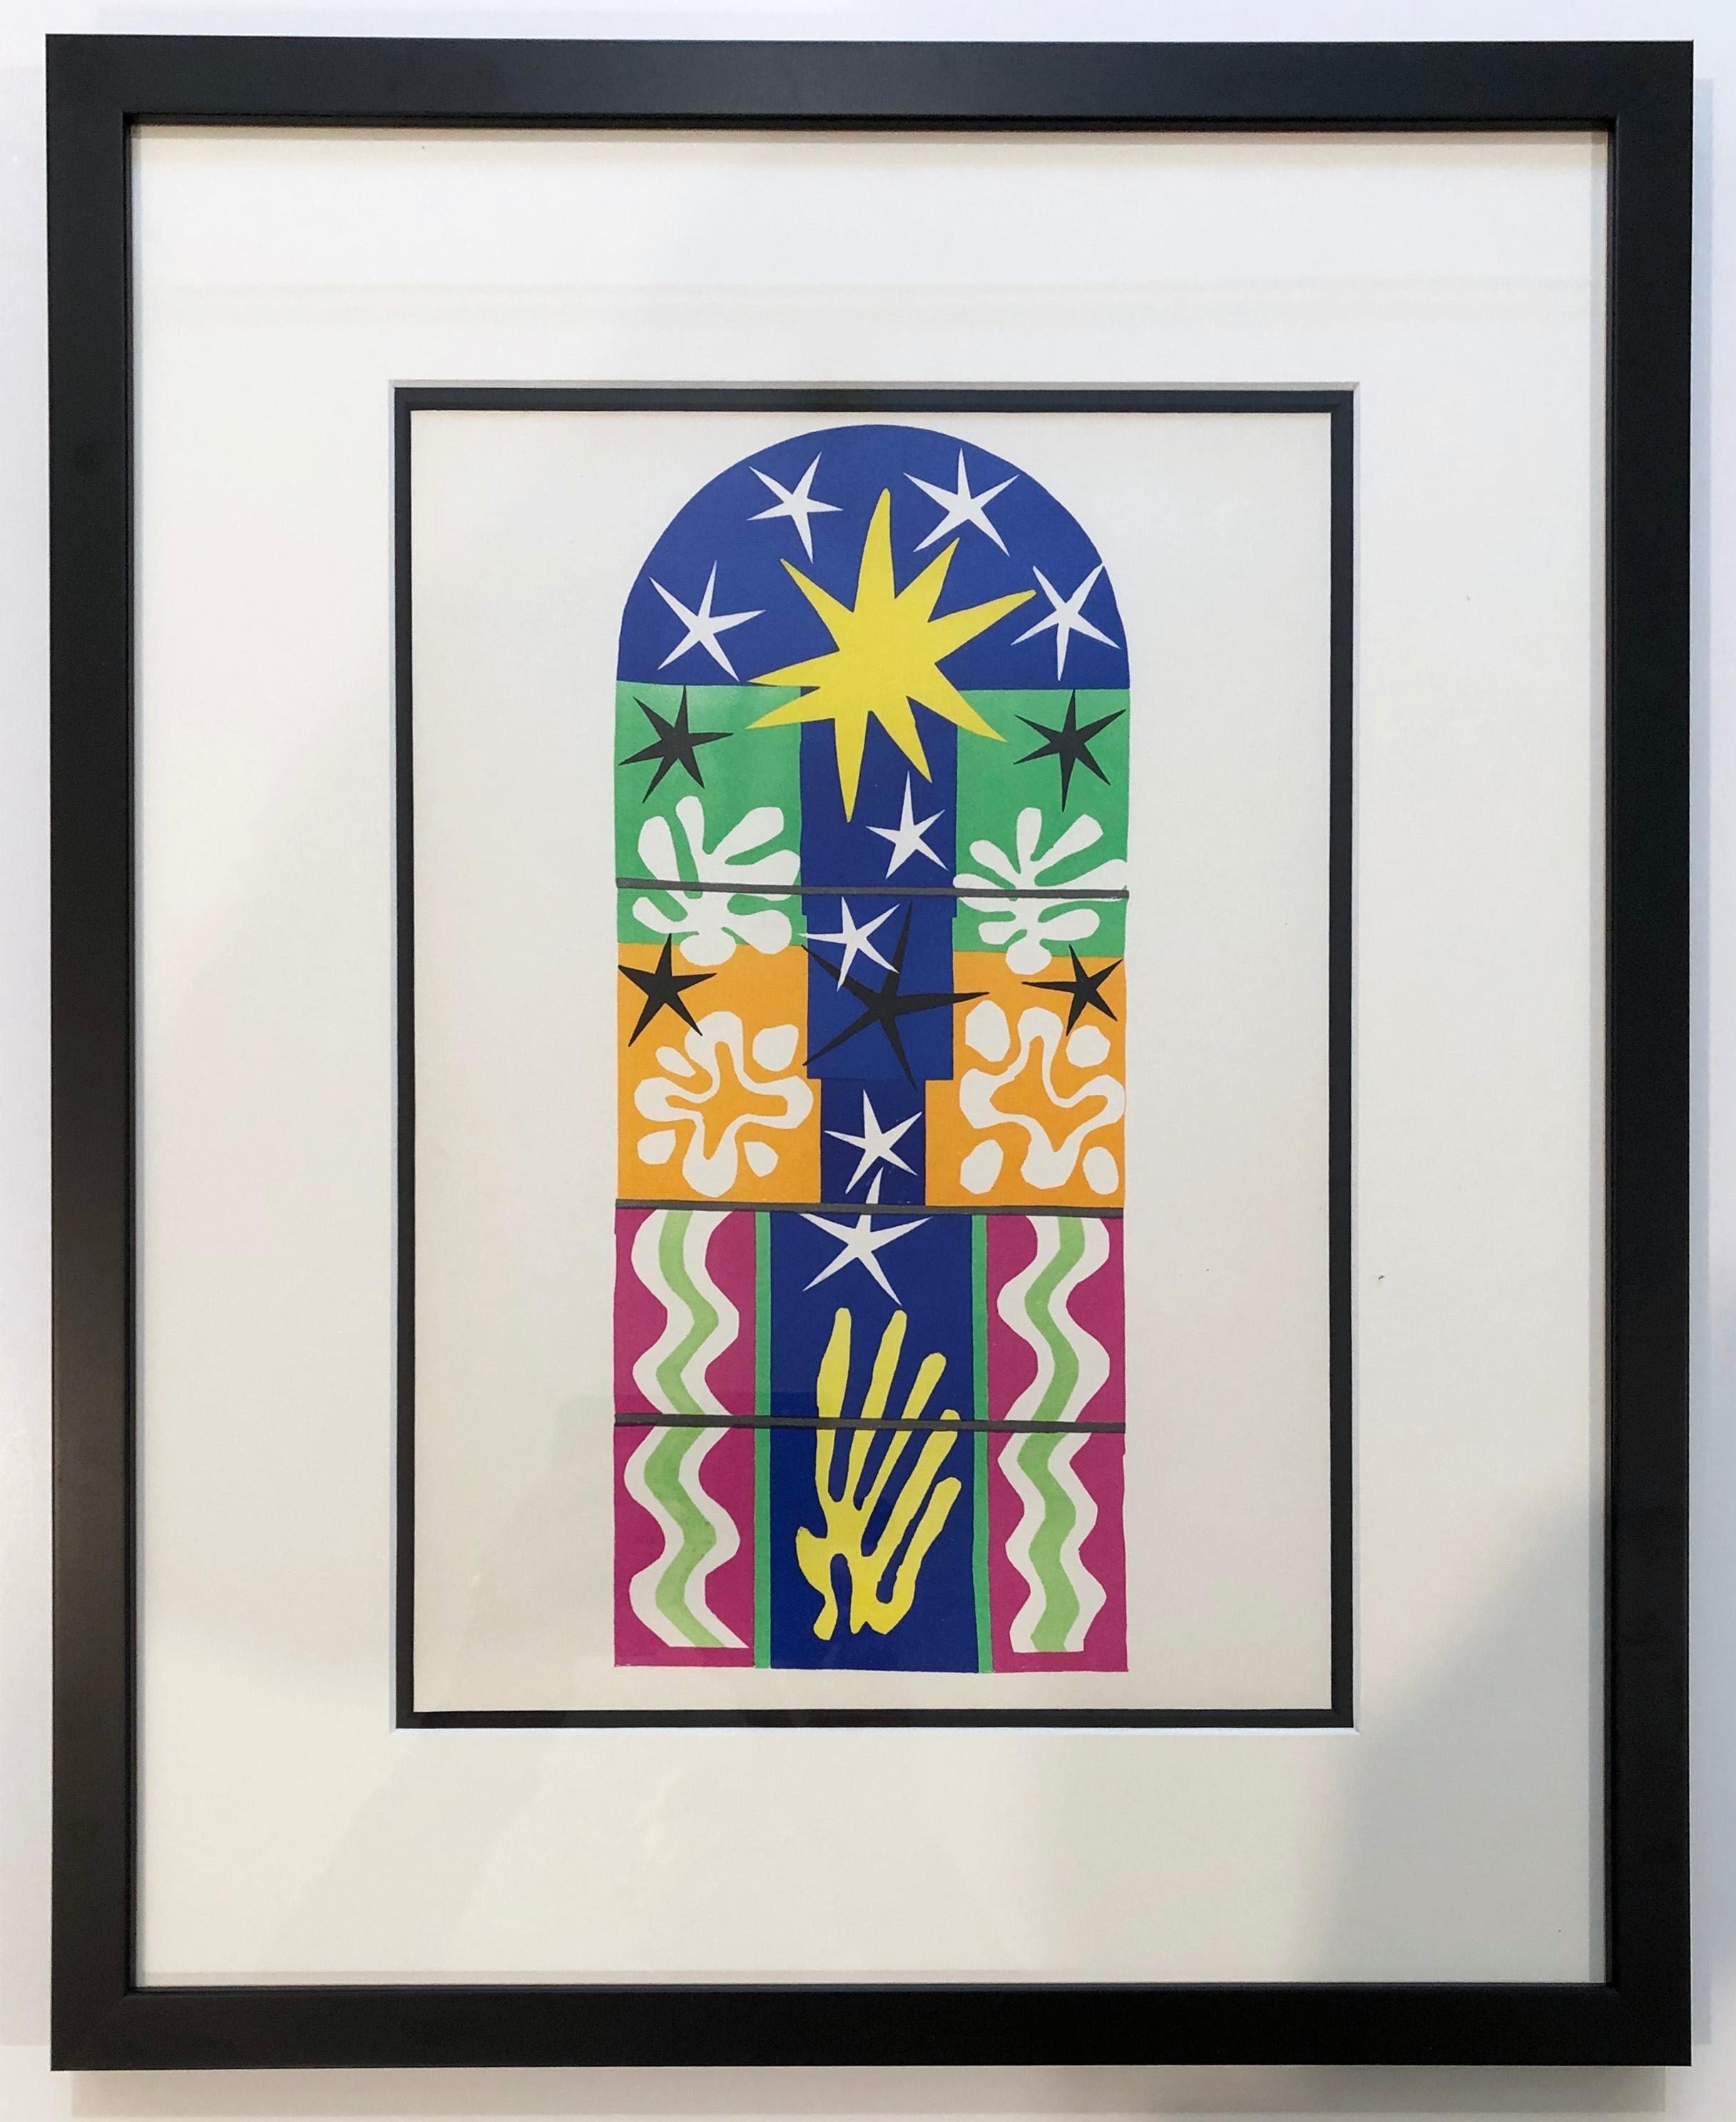 Nuit de Noel, from The Last Works of Henri Matisse